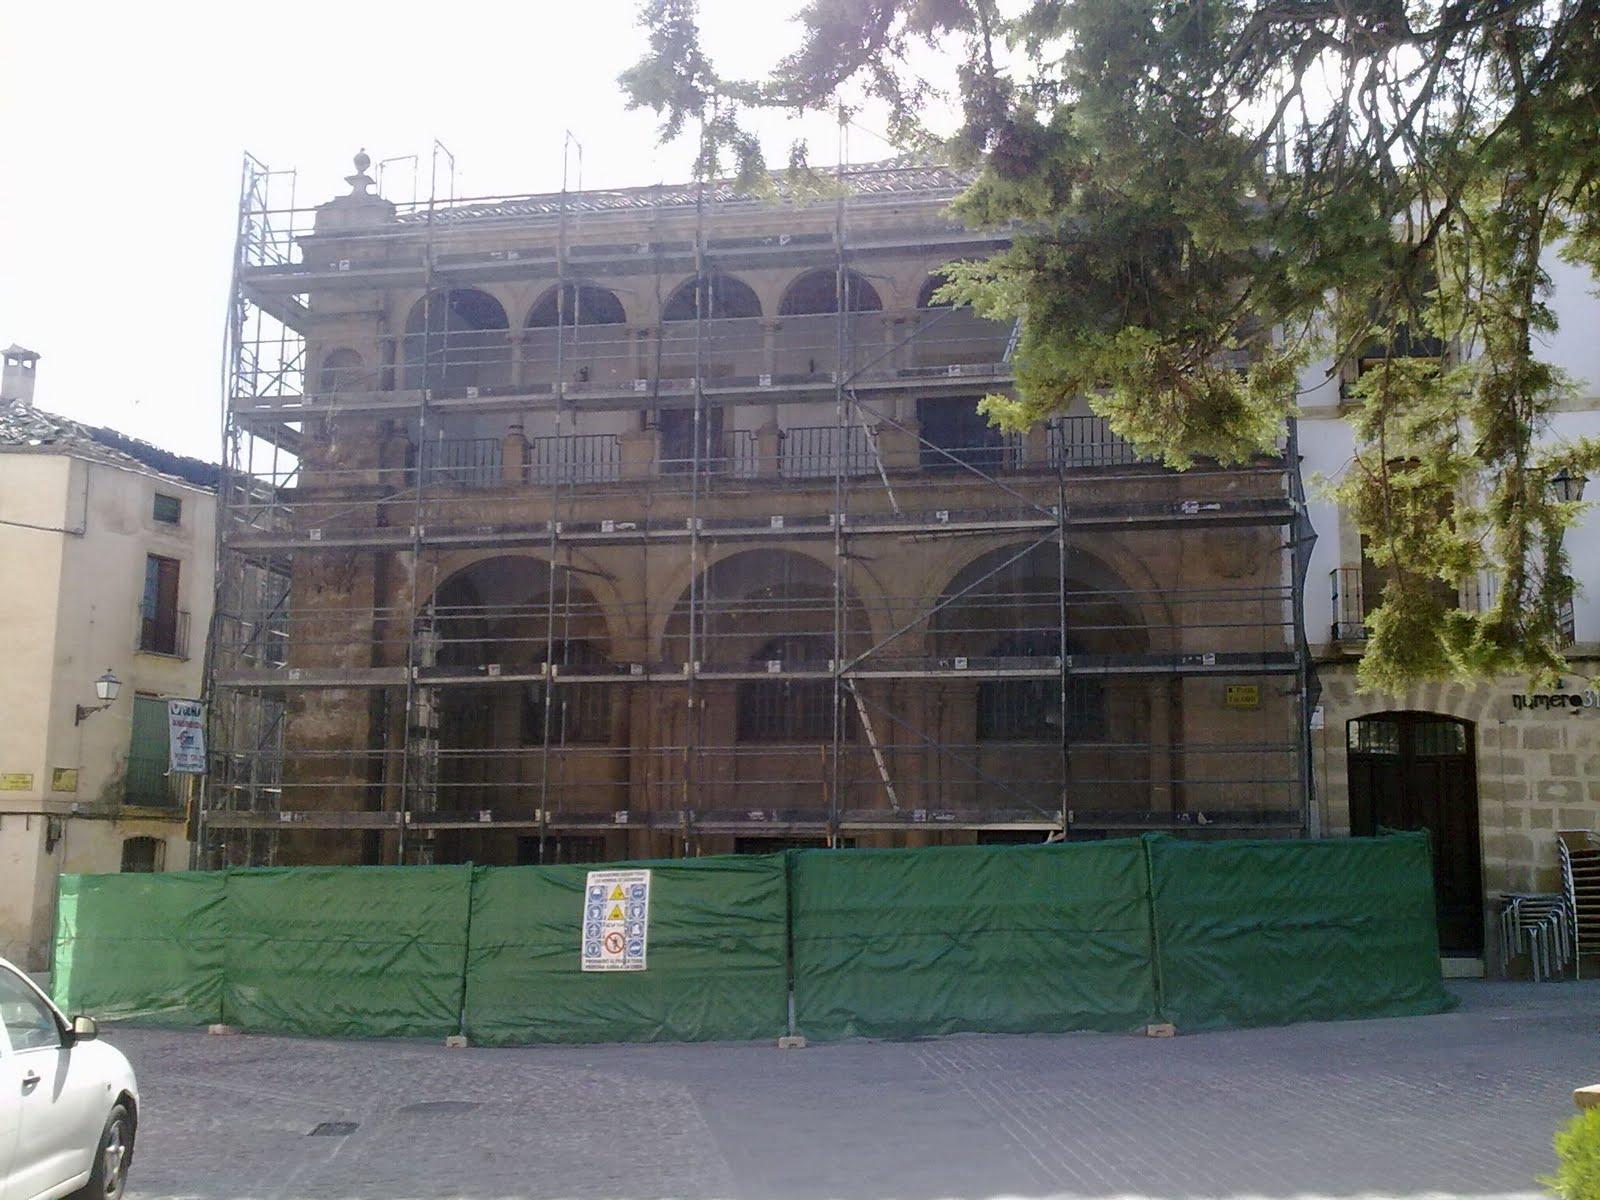 Vbeda recatada rehabilitaci n de las antiguas casas - Rehabilitacion de casas antiguas ...